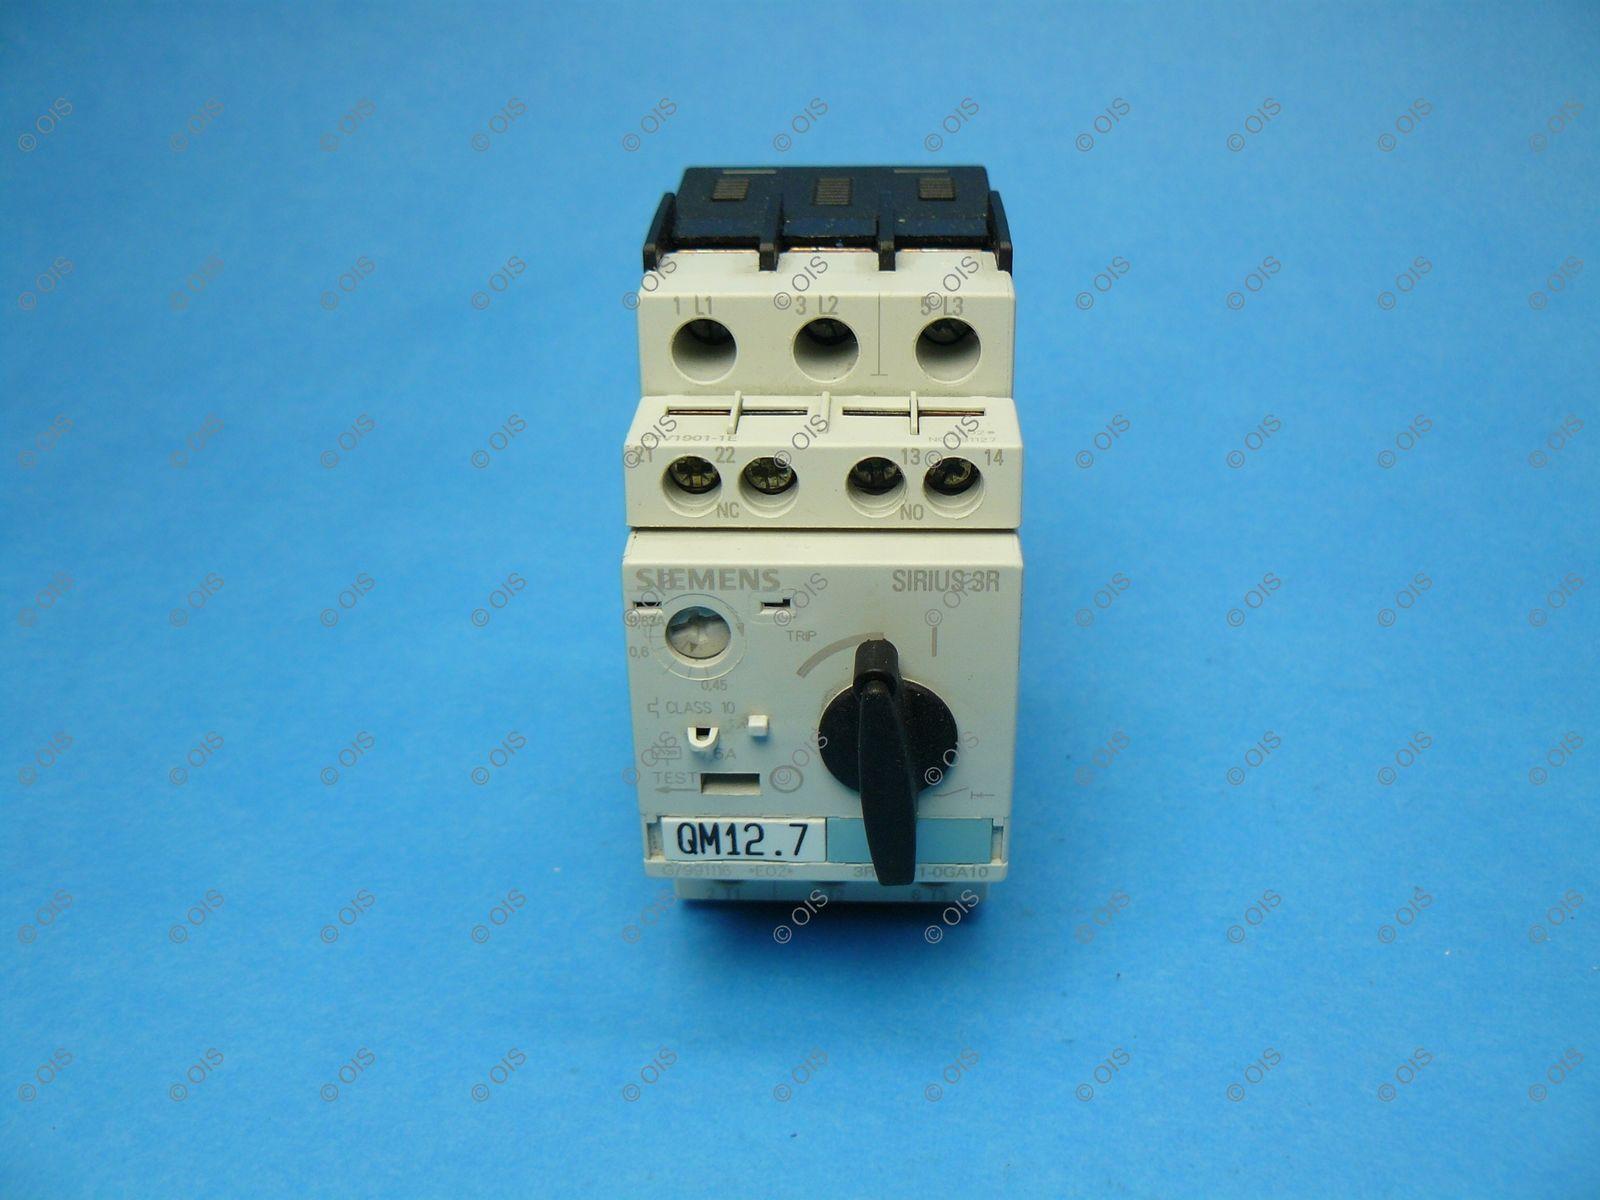 Siemens 3RV1021-0GA10 Sirius IEC Manual and similar items